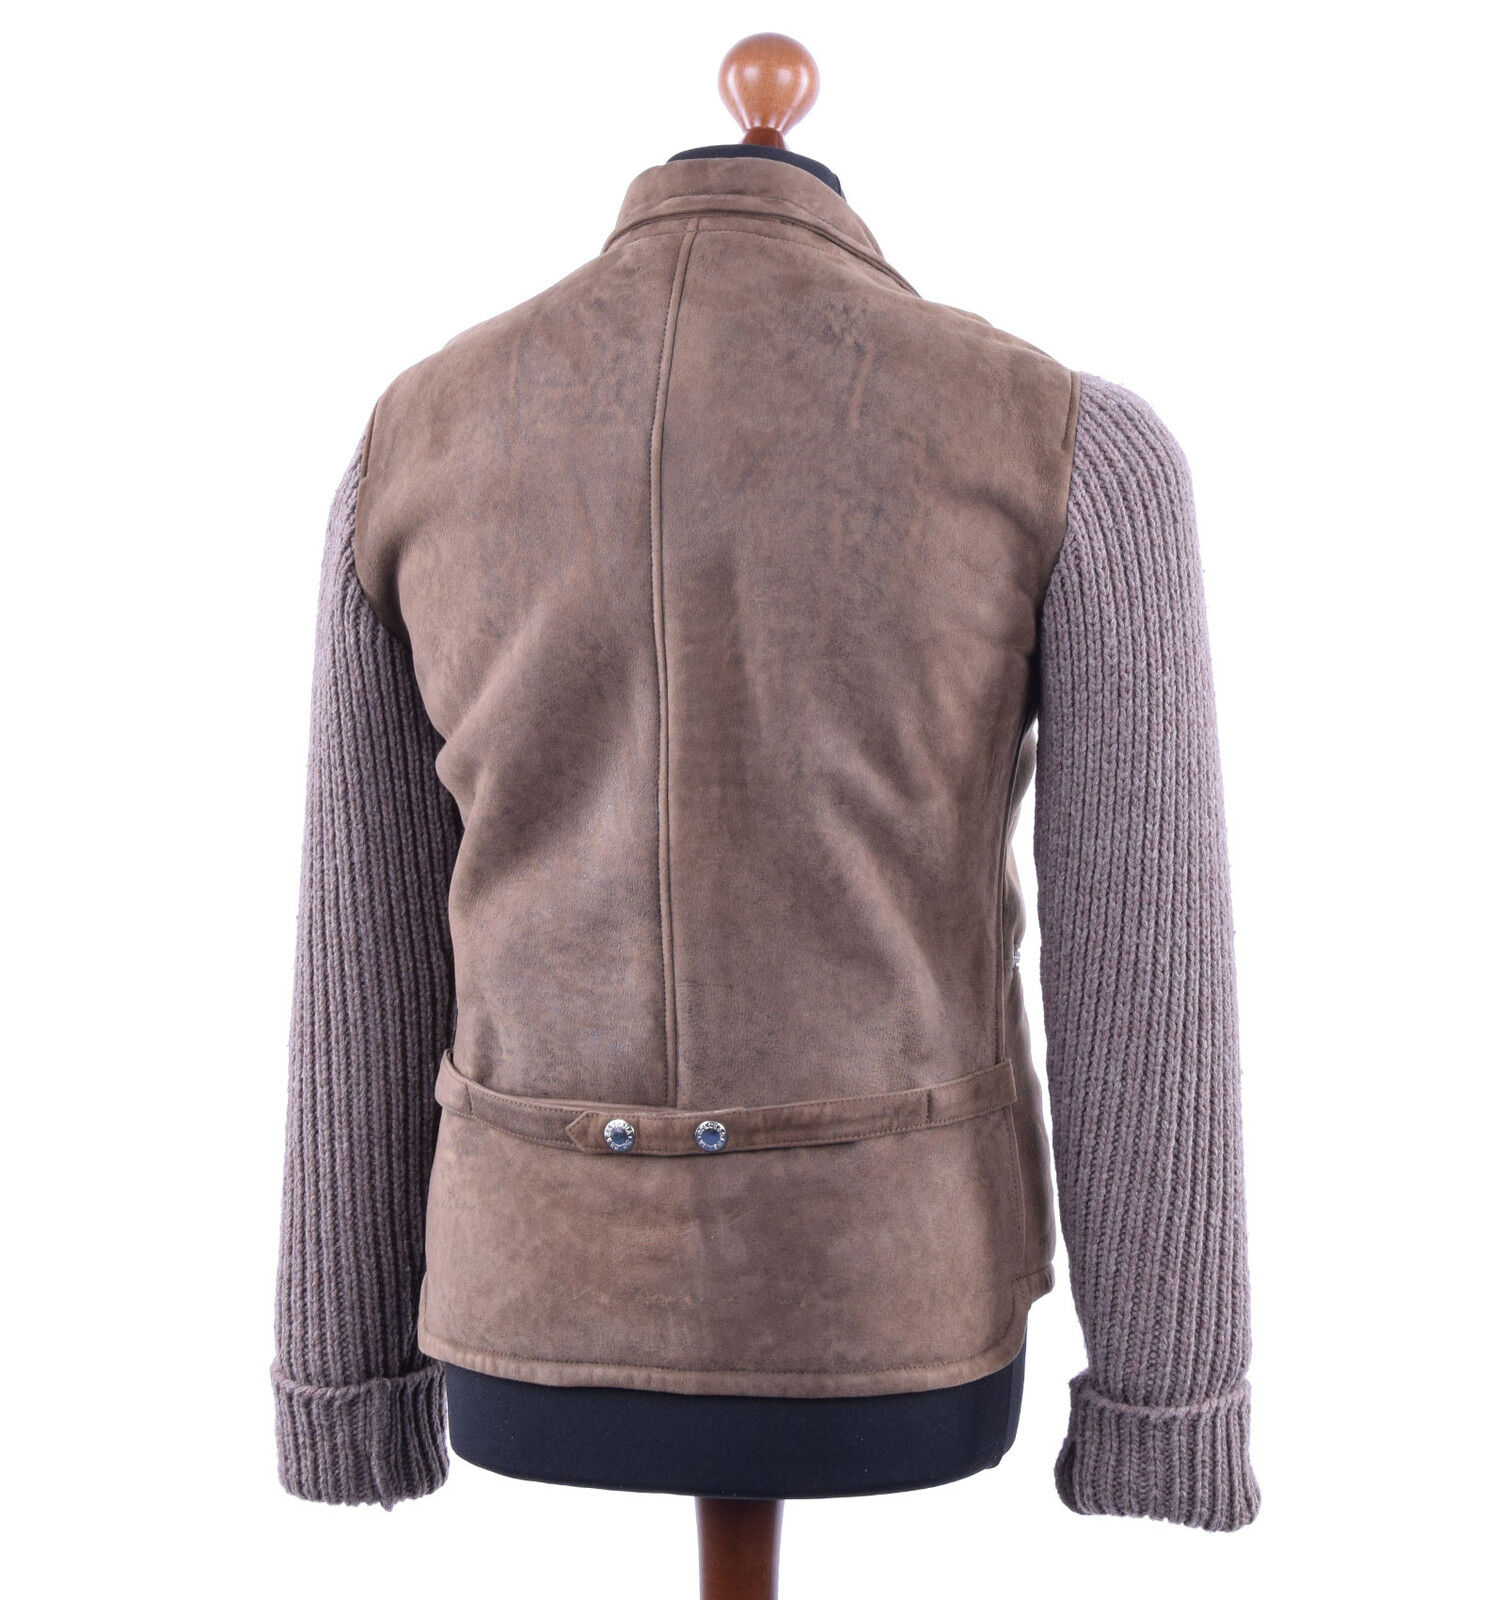 DOLCE & GABBANA GABBANA GABBANA Matelassée Veste en Cuir Veste Daim Marron Leather Jacket 03777 d05b9f